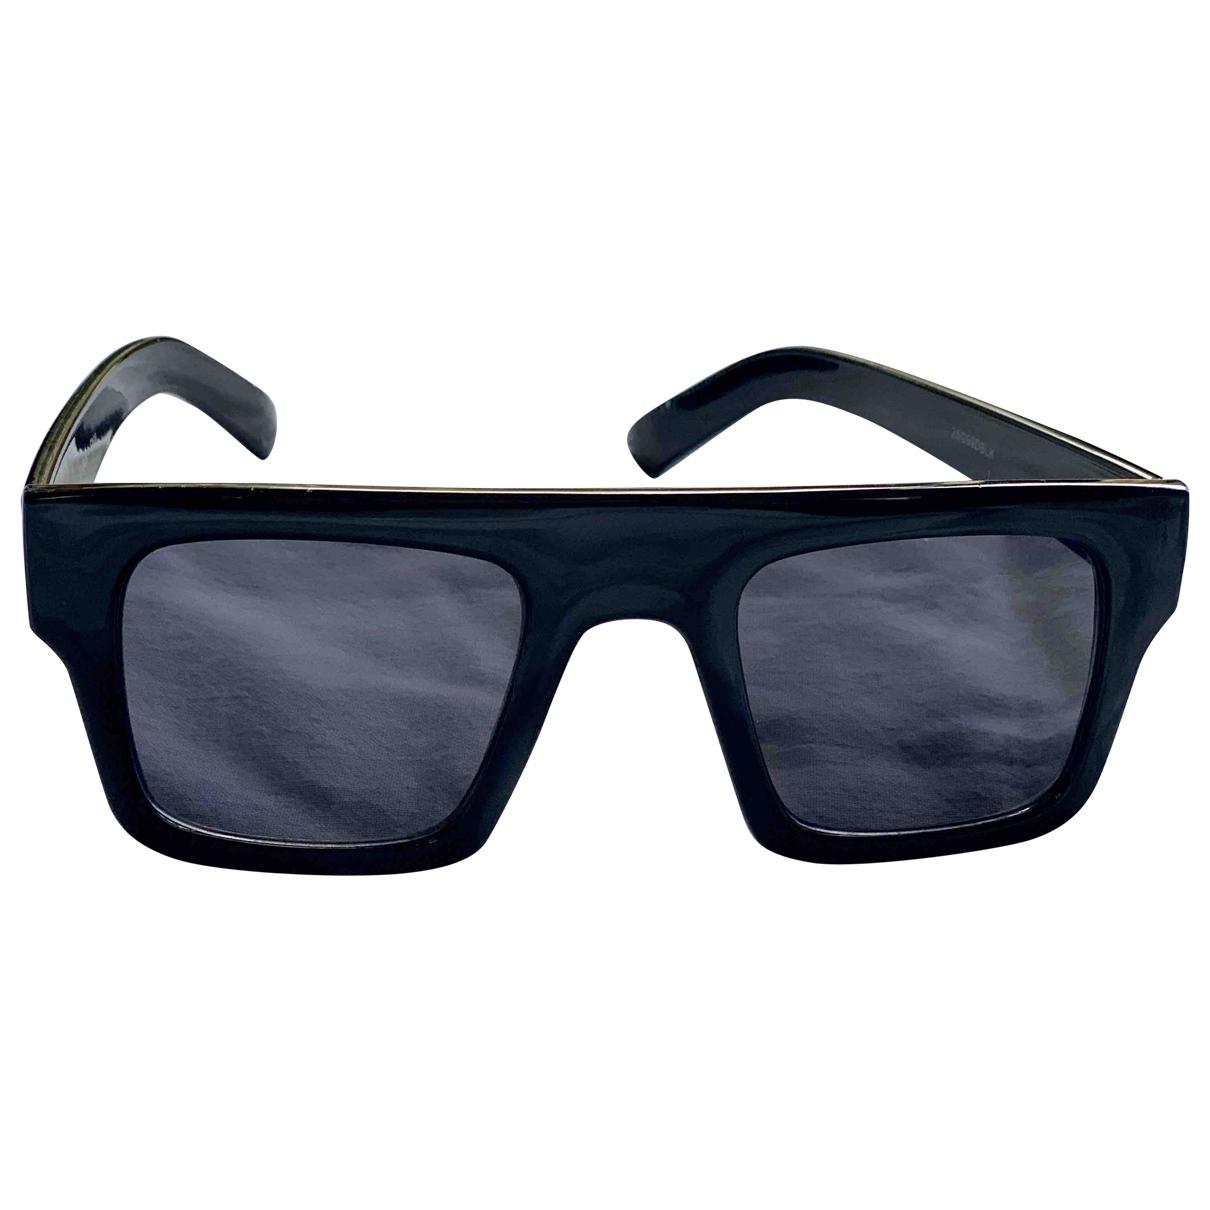 Tophop X J.w. Anderson \N Sonnenbrillen in  Schwarz Kunststoff